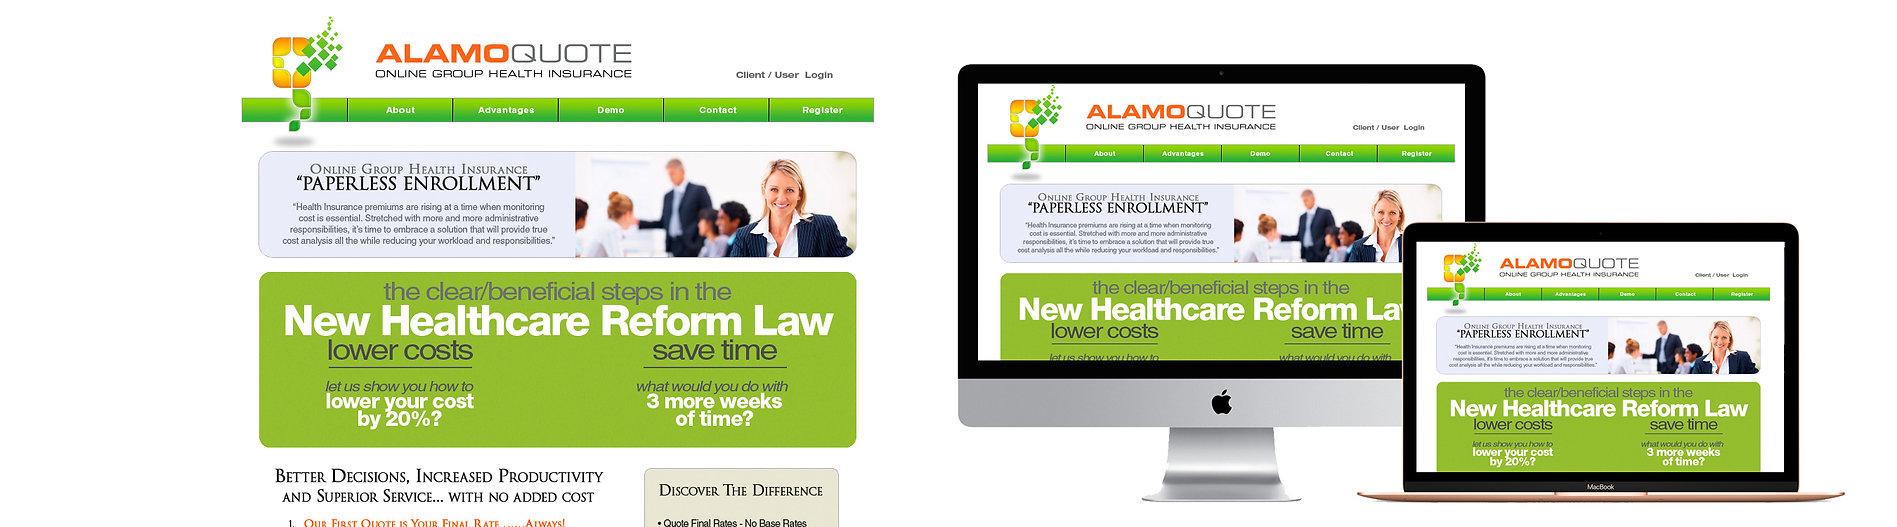 Websites_Stories_Alamoquote.jpg